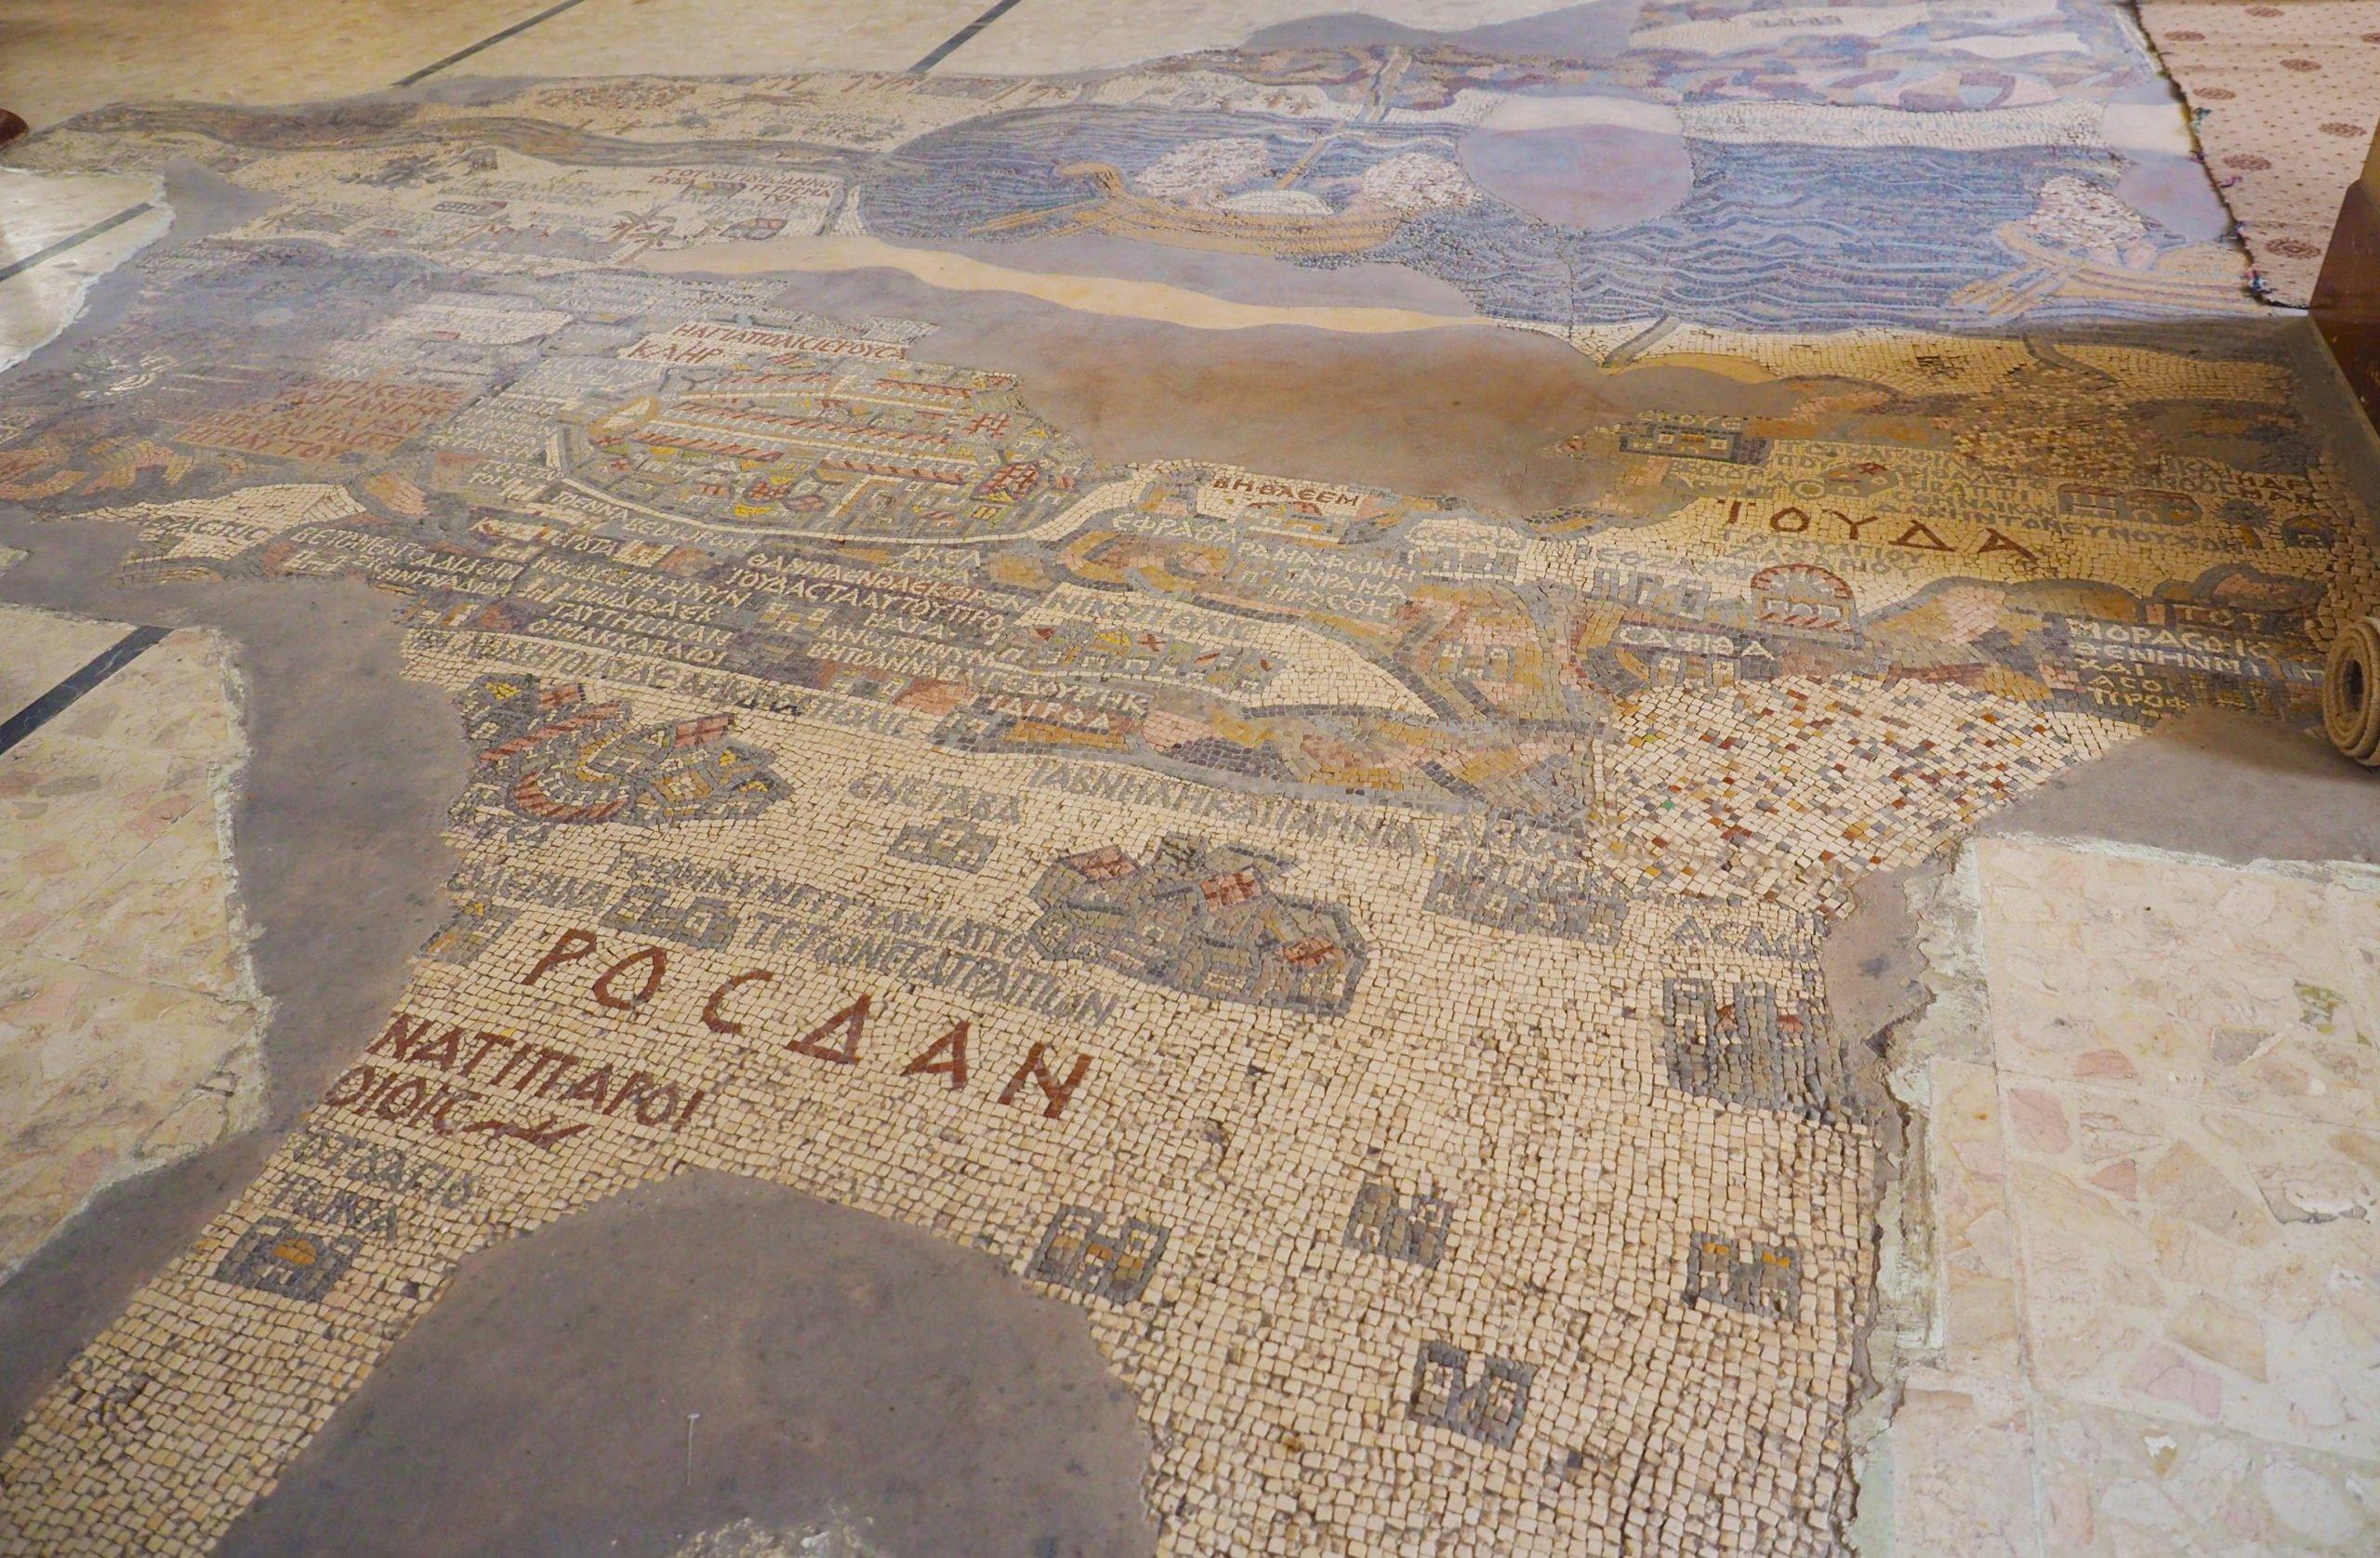 Mosaic Madaba